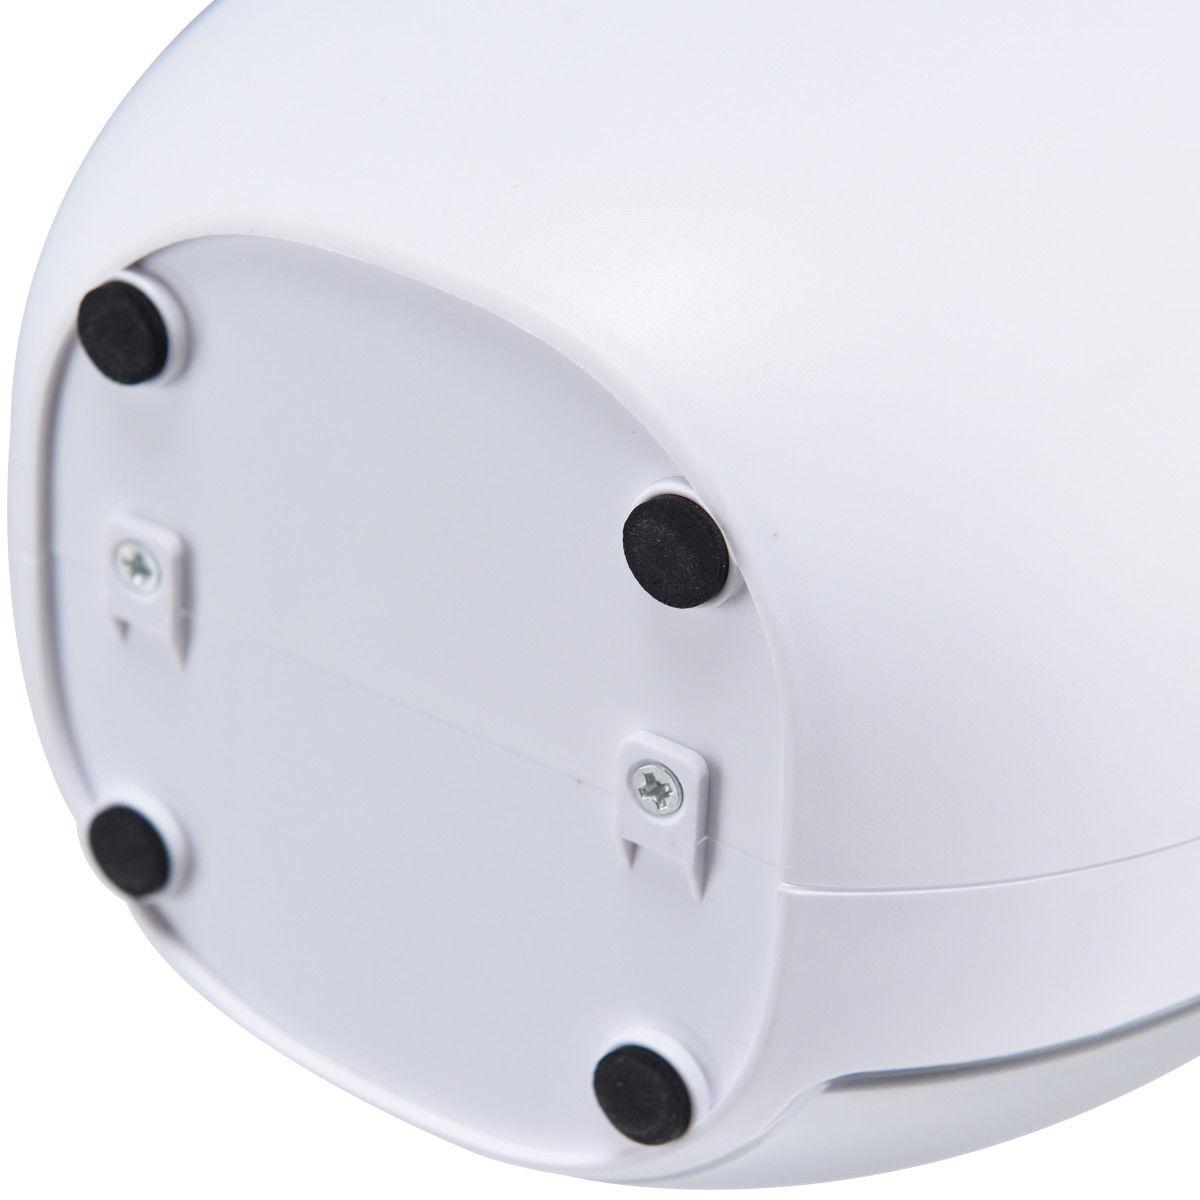 150 Sq.ft Portable Quiet Safe Mini Electric Dehumidifier